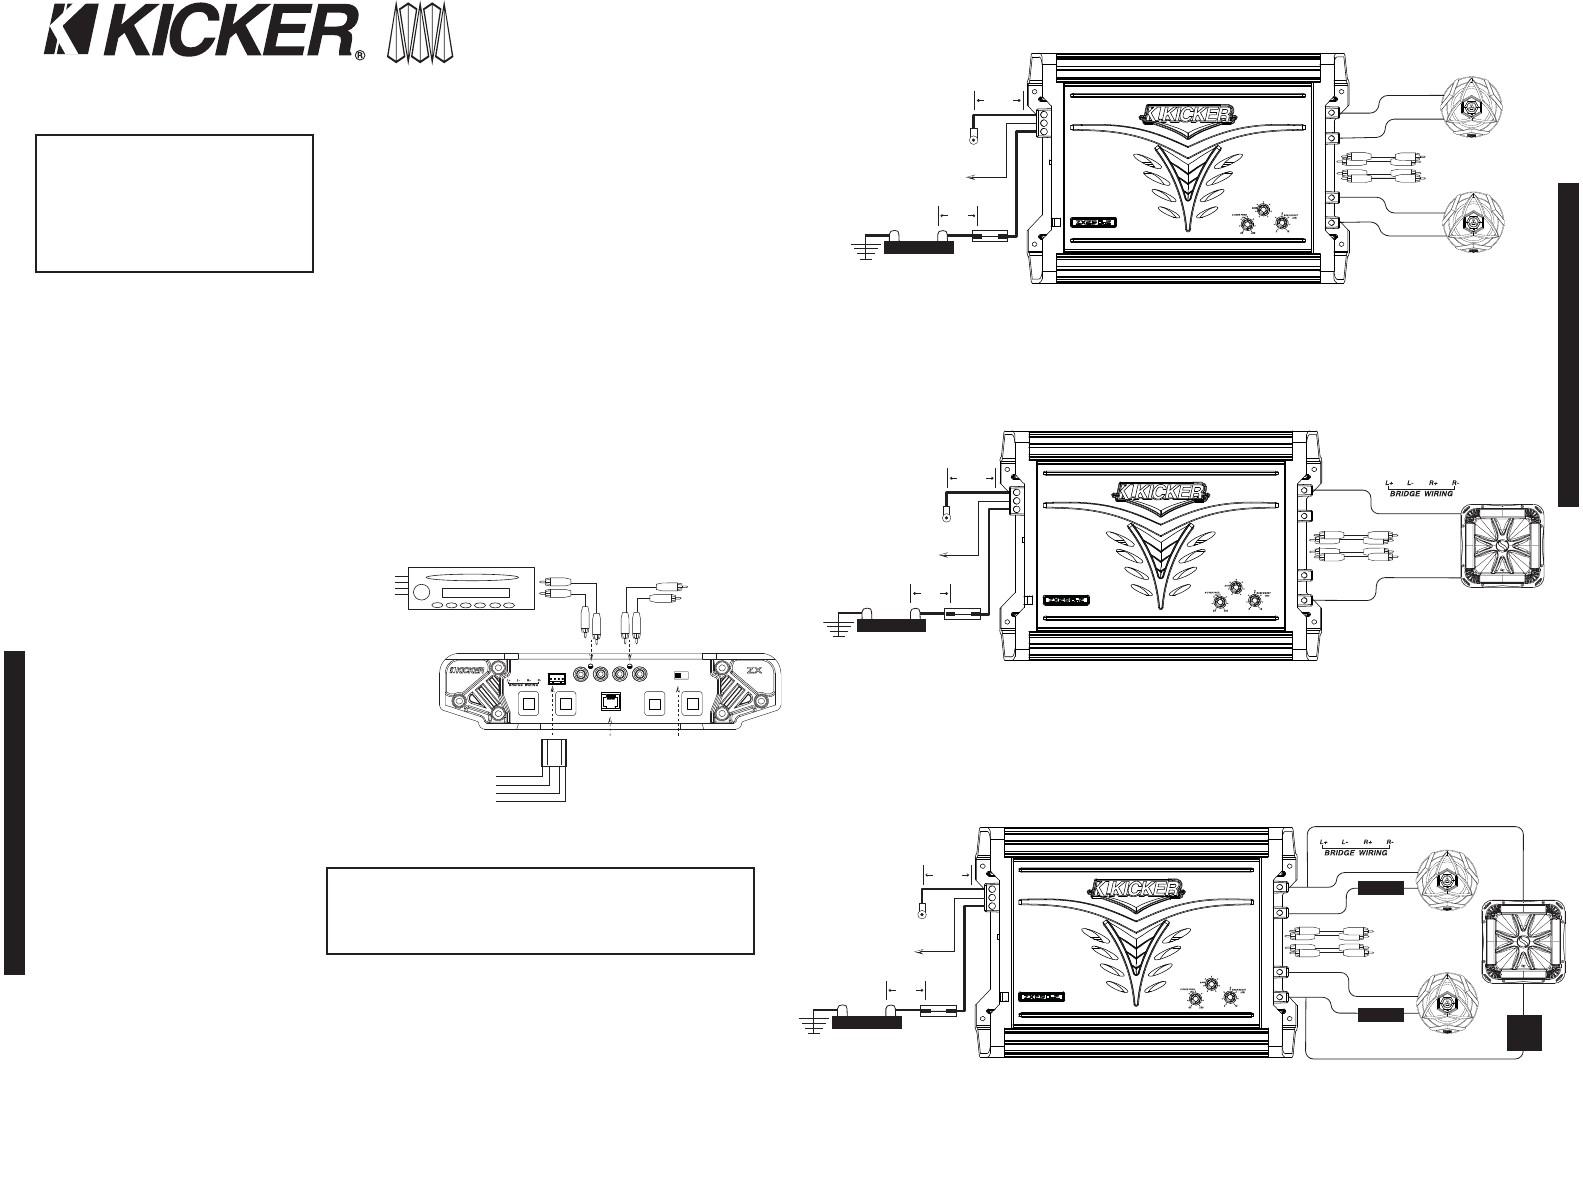 cvr 12 wiring diagram wiring diagram  kicker cvr 12 wiring diagram fuse box \& wiring diagramkicker comp wiring diagram auto electrical